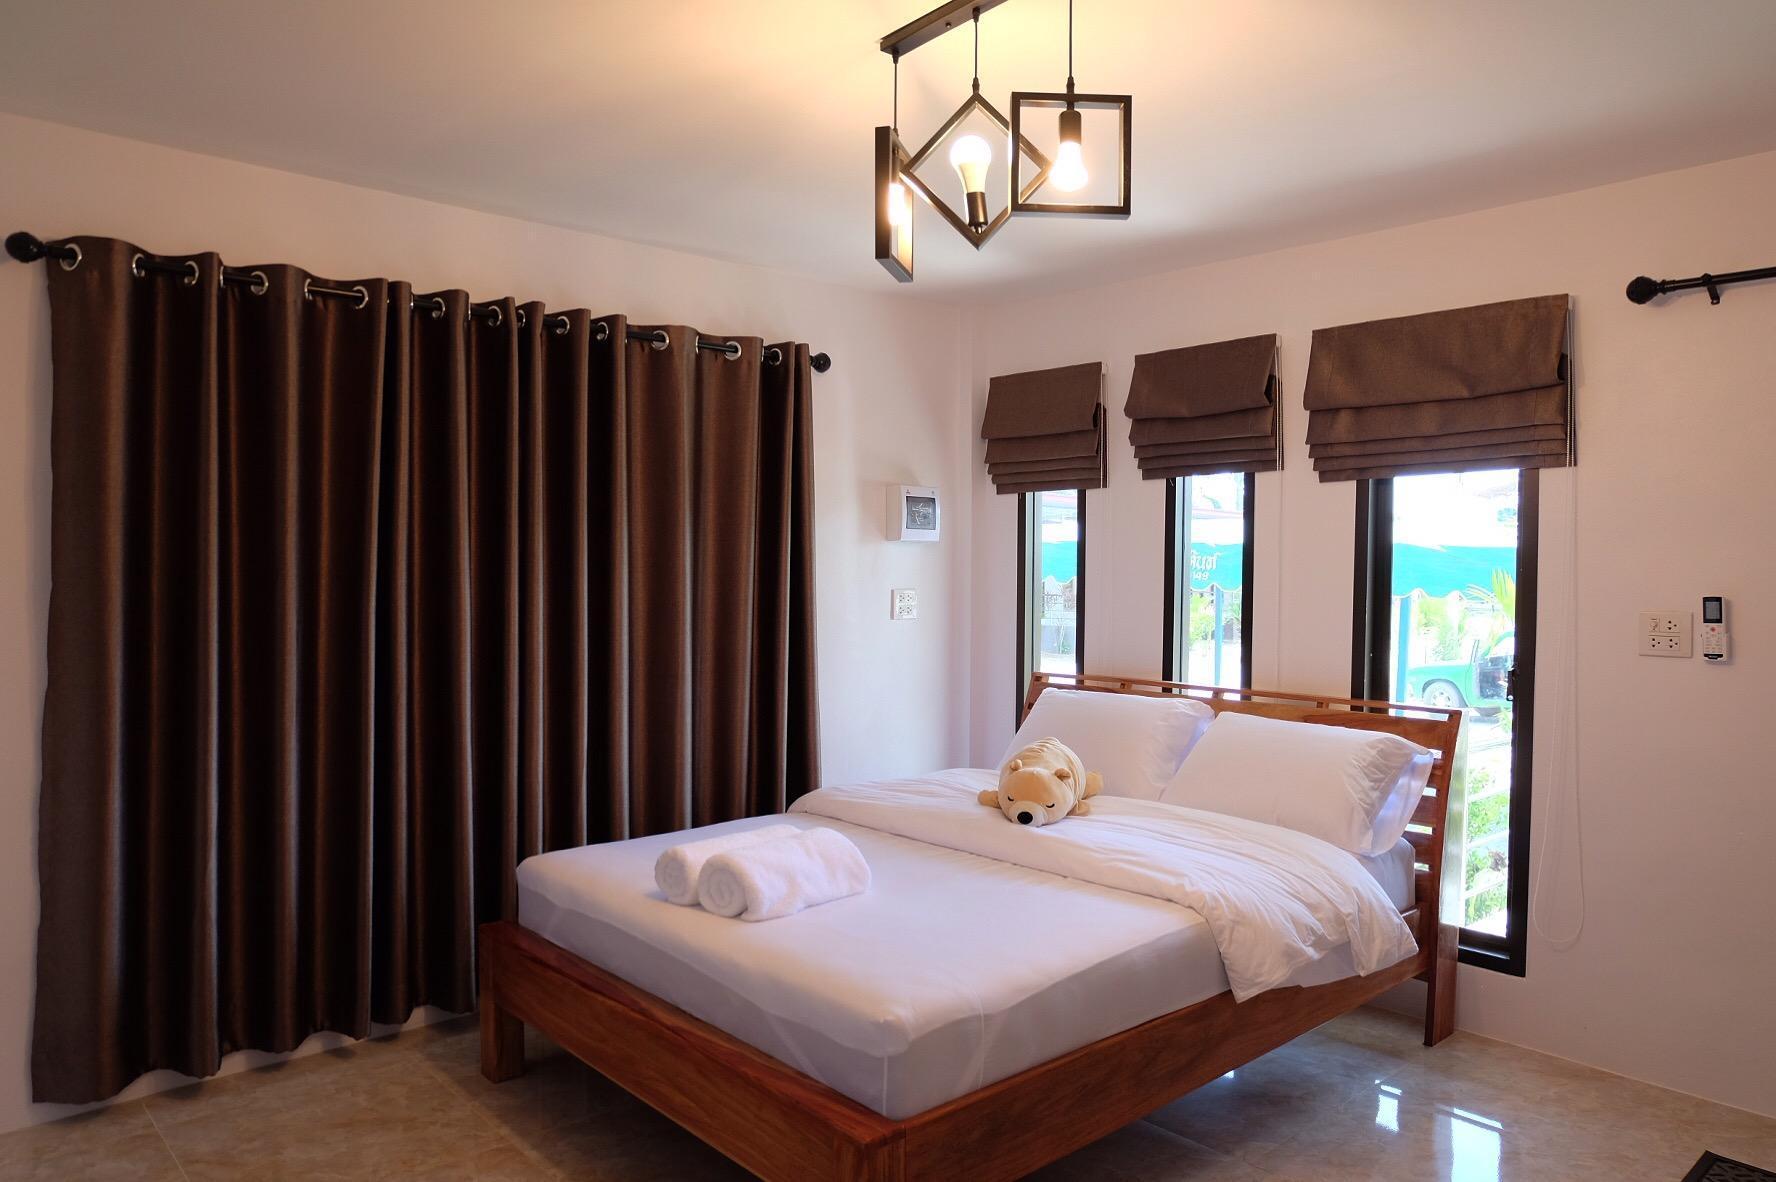 Futago Resort Rayong บ้านเดี่ยว 1 ห้องนอน 1 ห้องน้ำส่วนตัว ขนาด 25 ตร.ม. – ตะพง